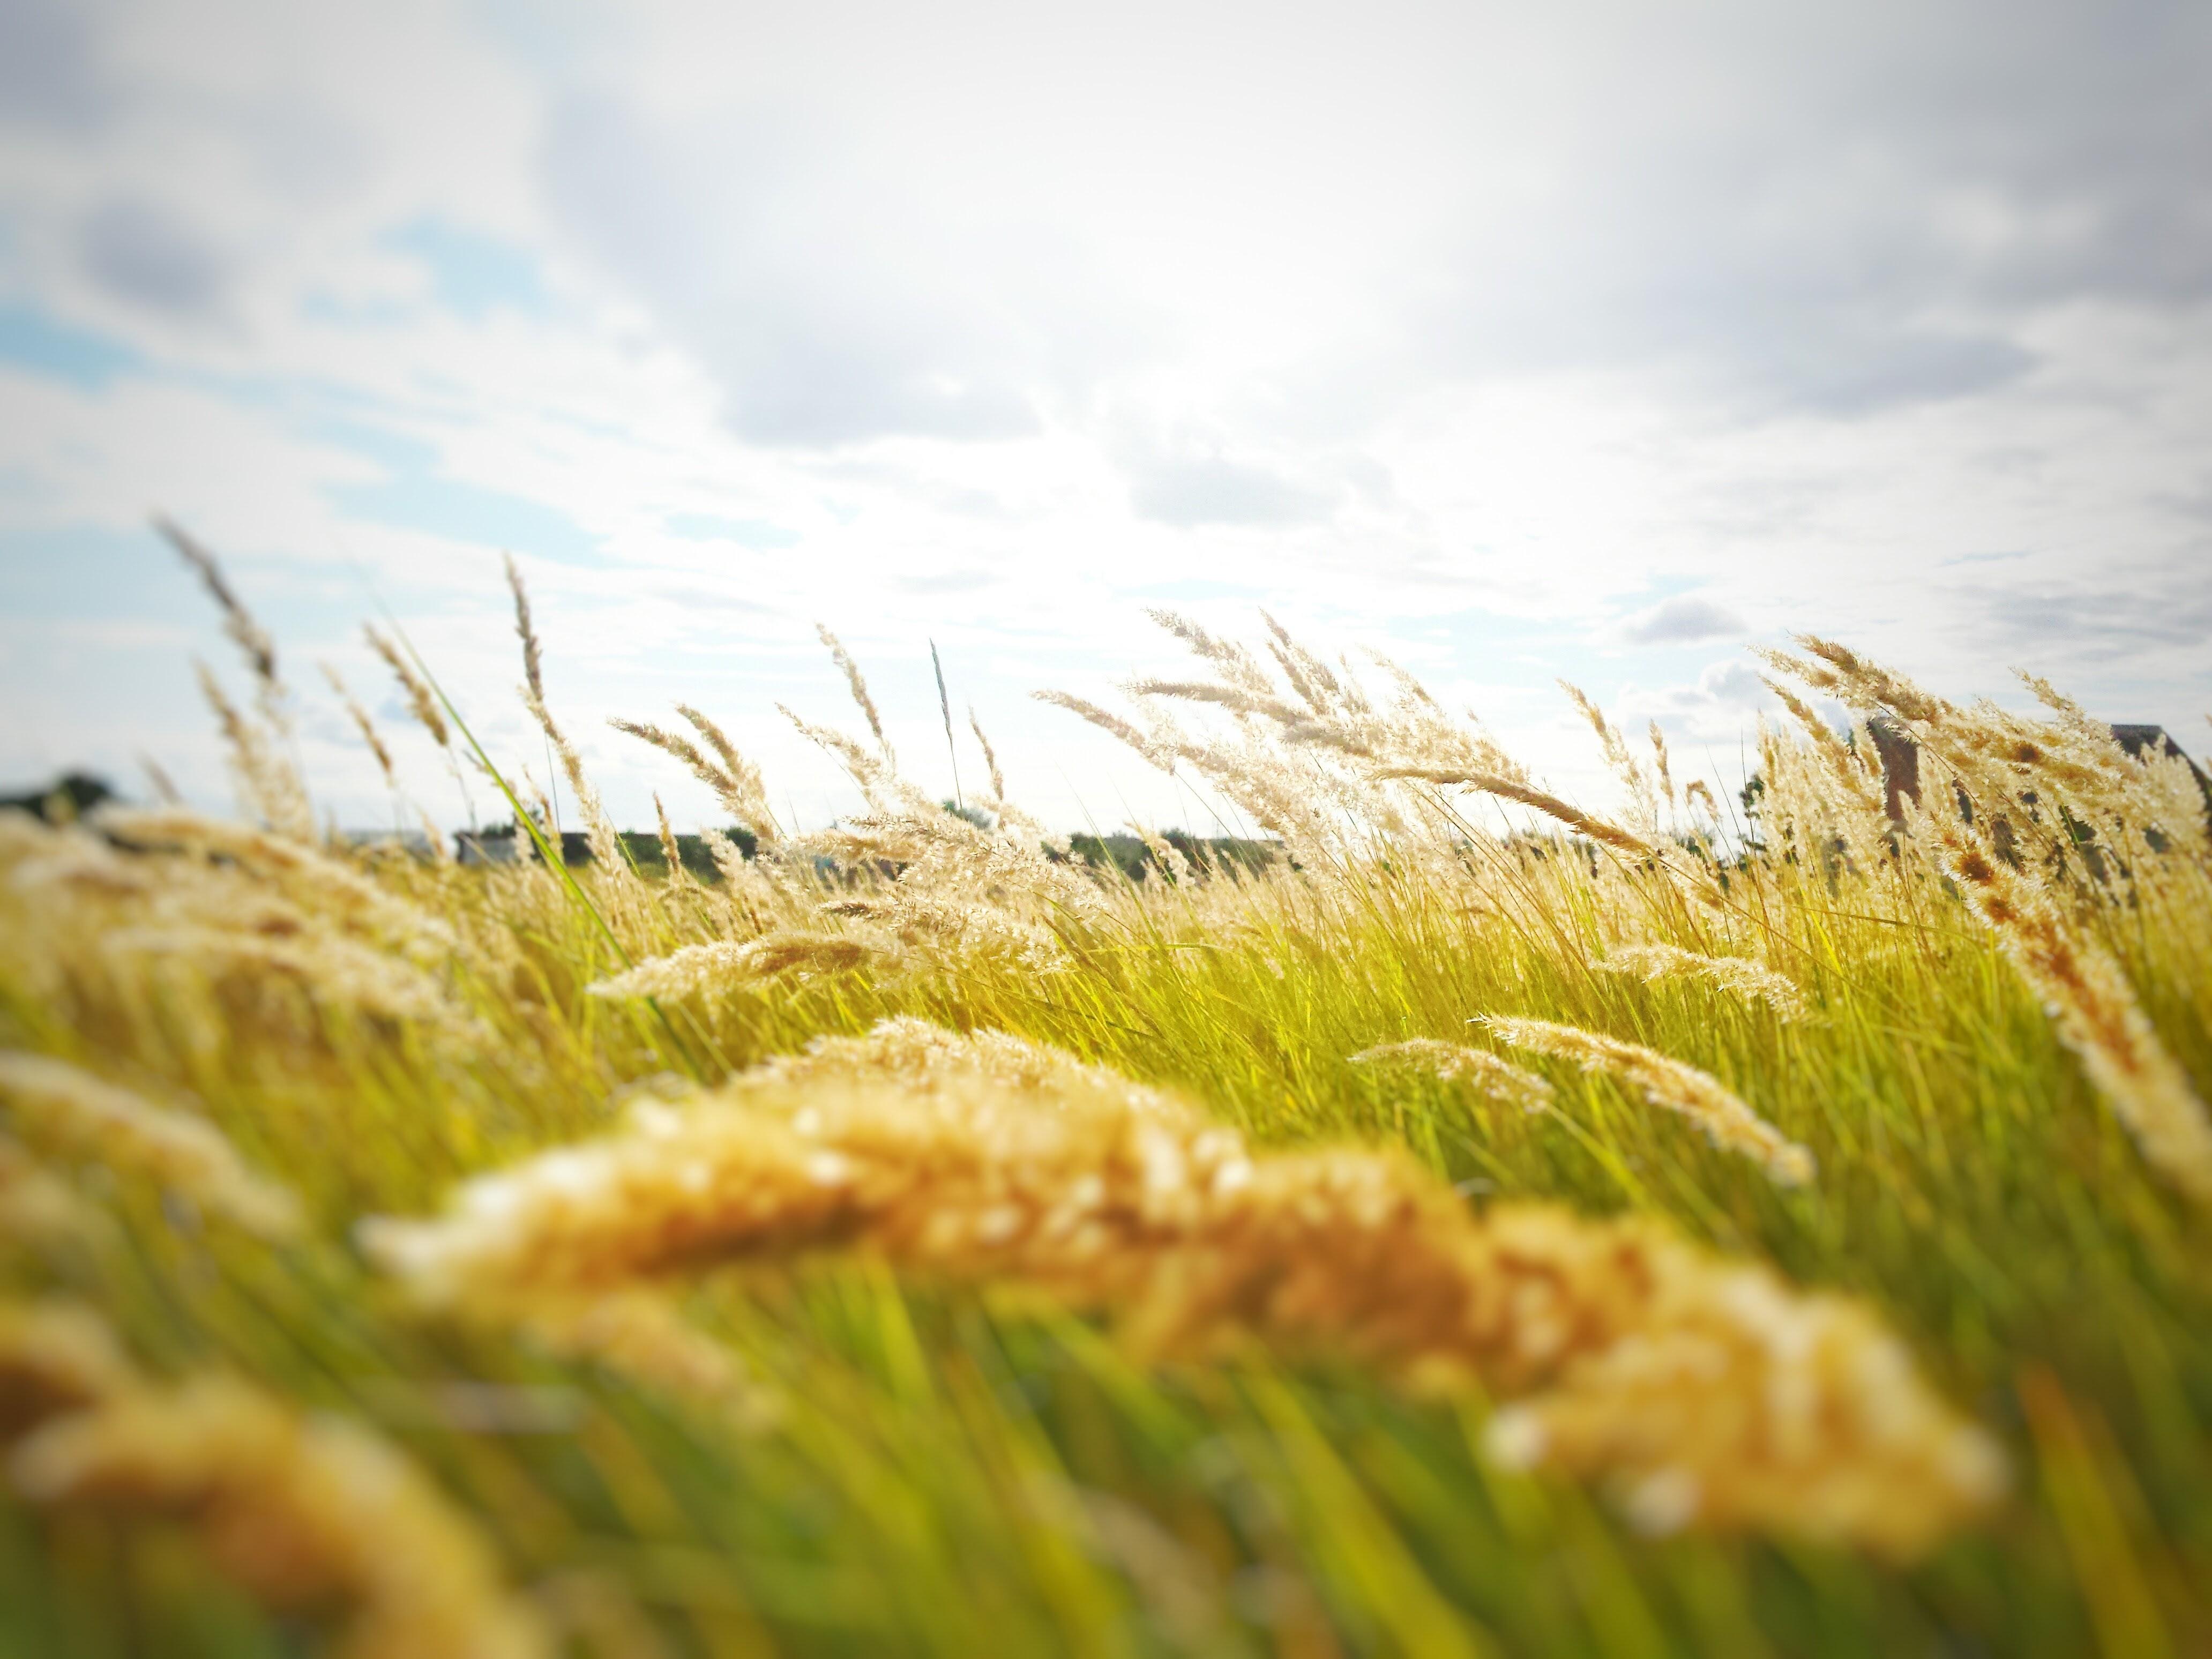 Rice Grain Grass Field 183 Free Stock Photo